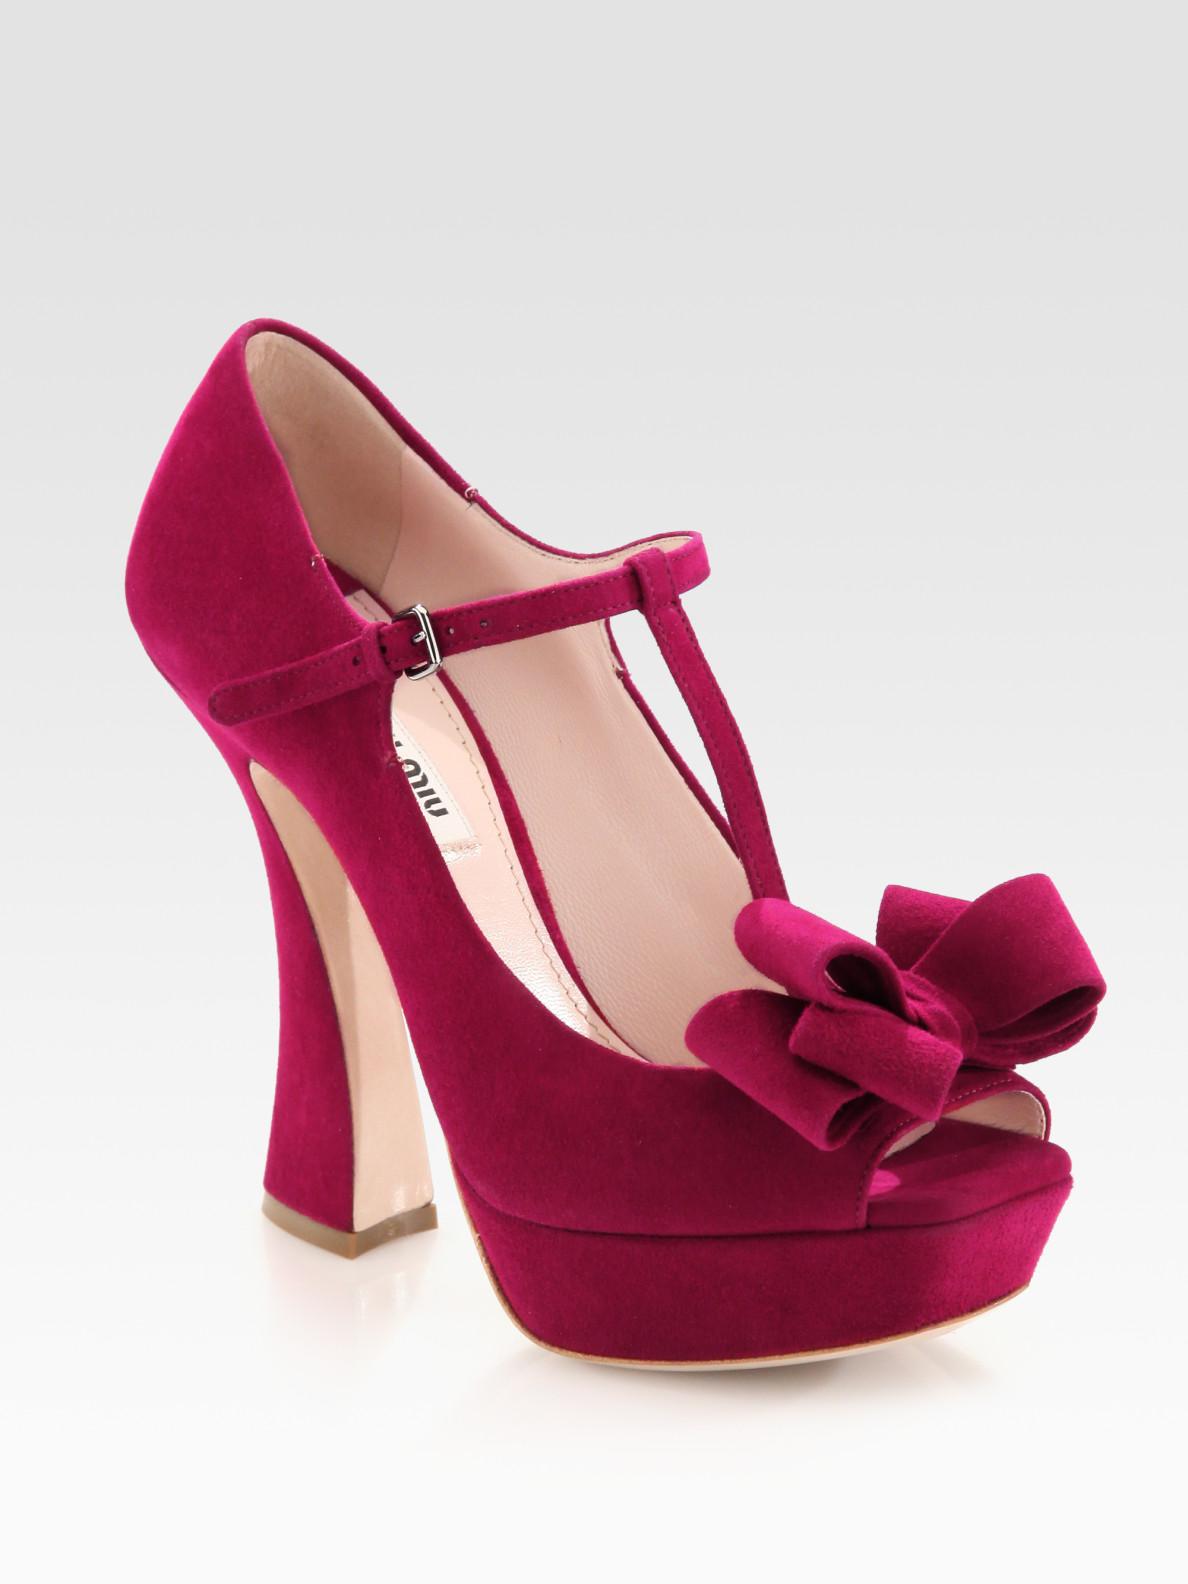 b1bff310858c Lyst - Miu Miu Suede Peep Toe Tstrap Bow Pumps in Pink